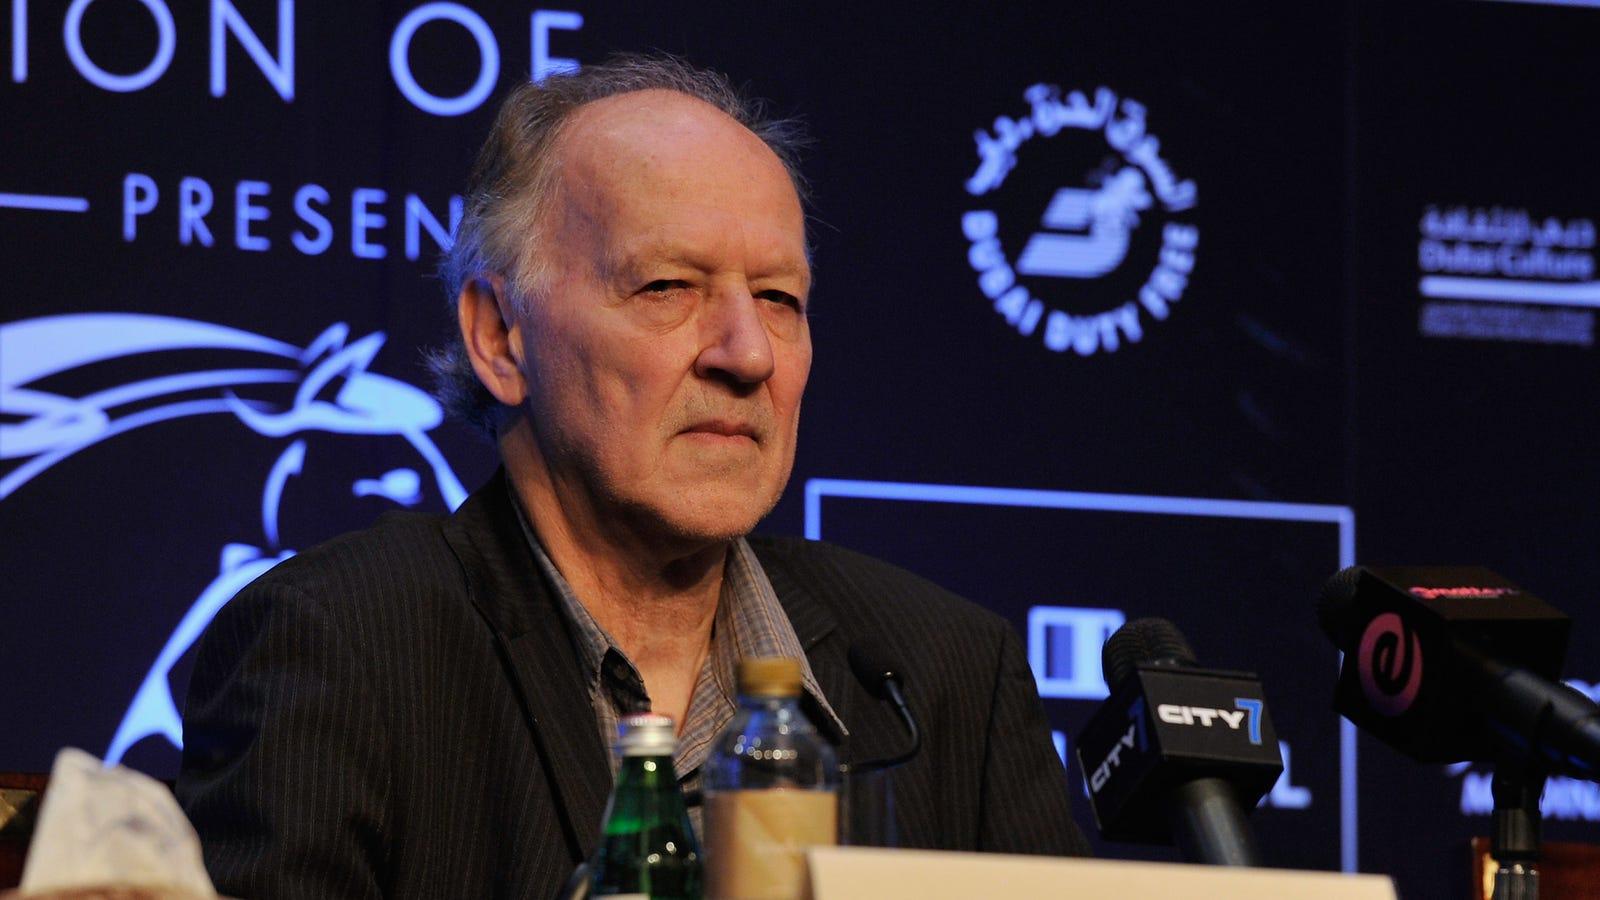 It's Rumor Time: Werner Herzog might be inThe Mandalorian